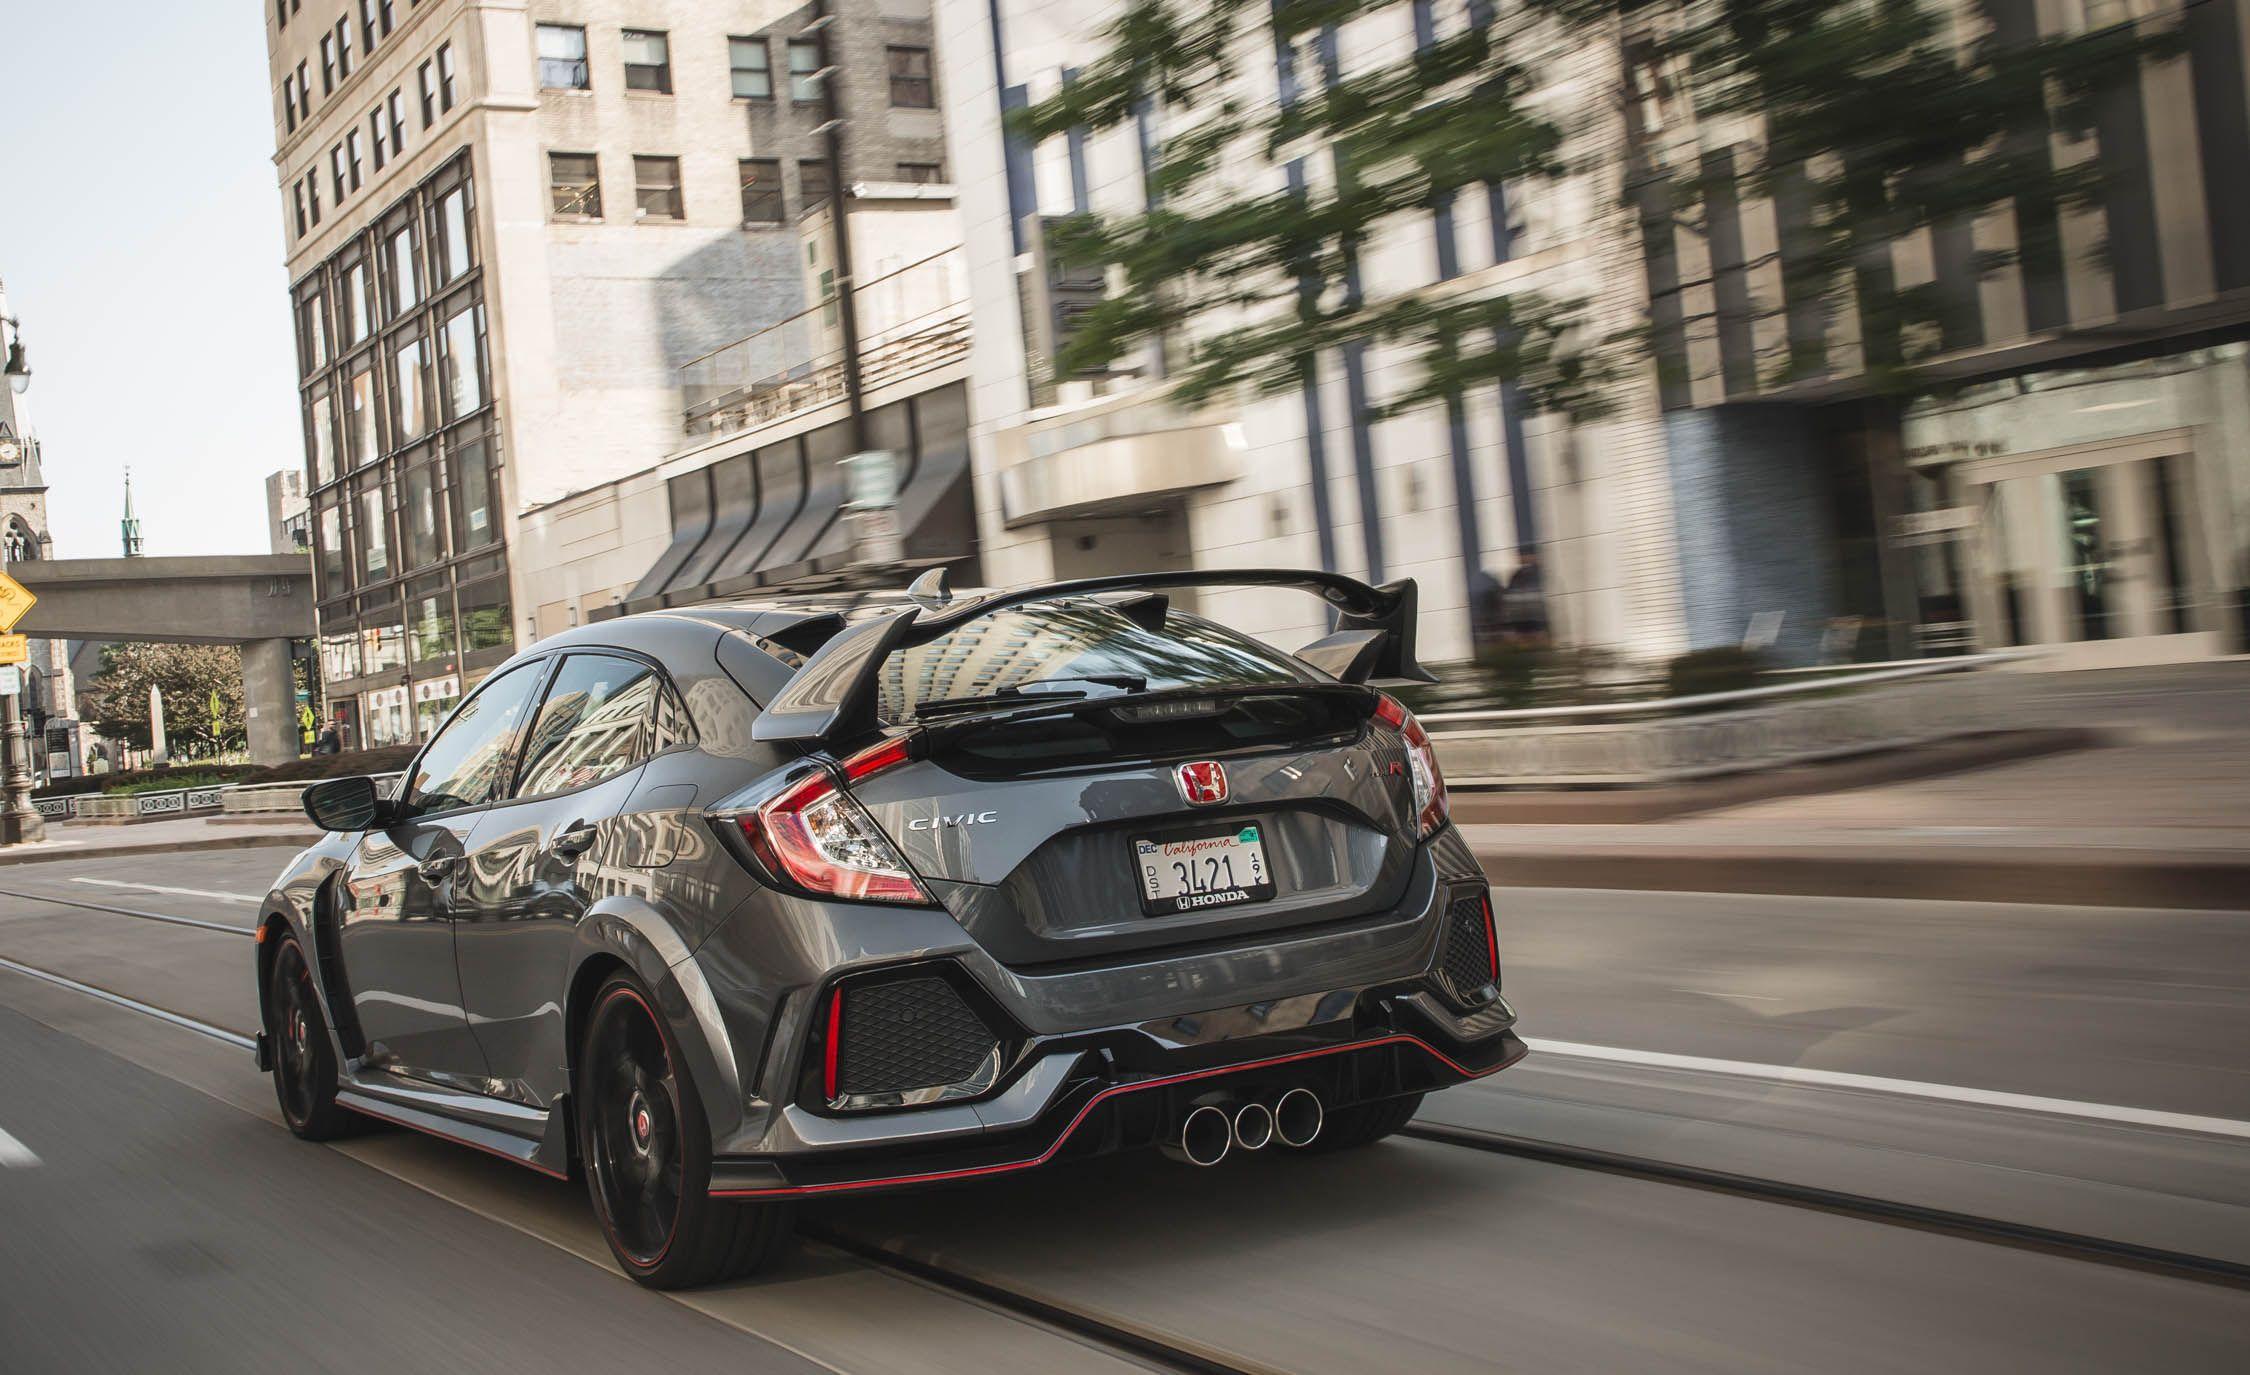 2017 Honda Civic Type R  InDepth Model Review  Car and Driver